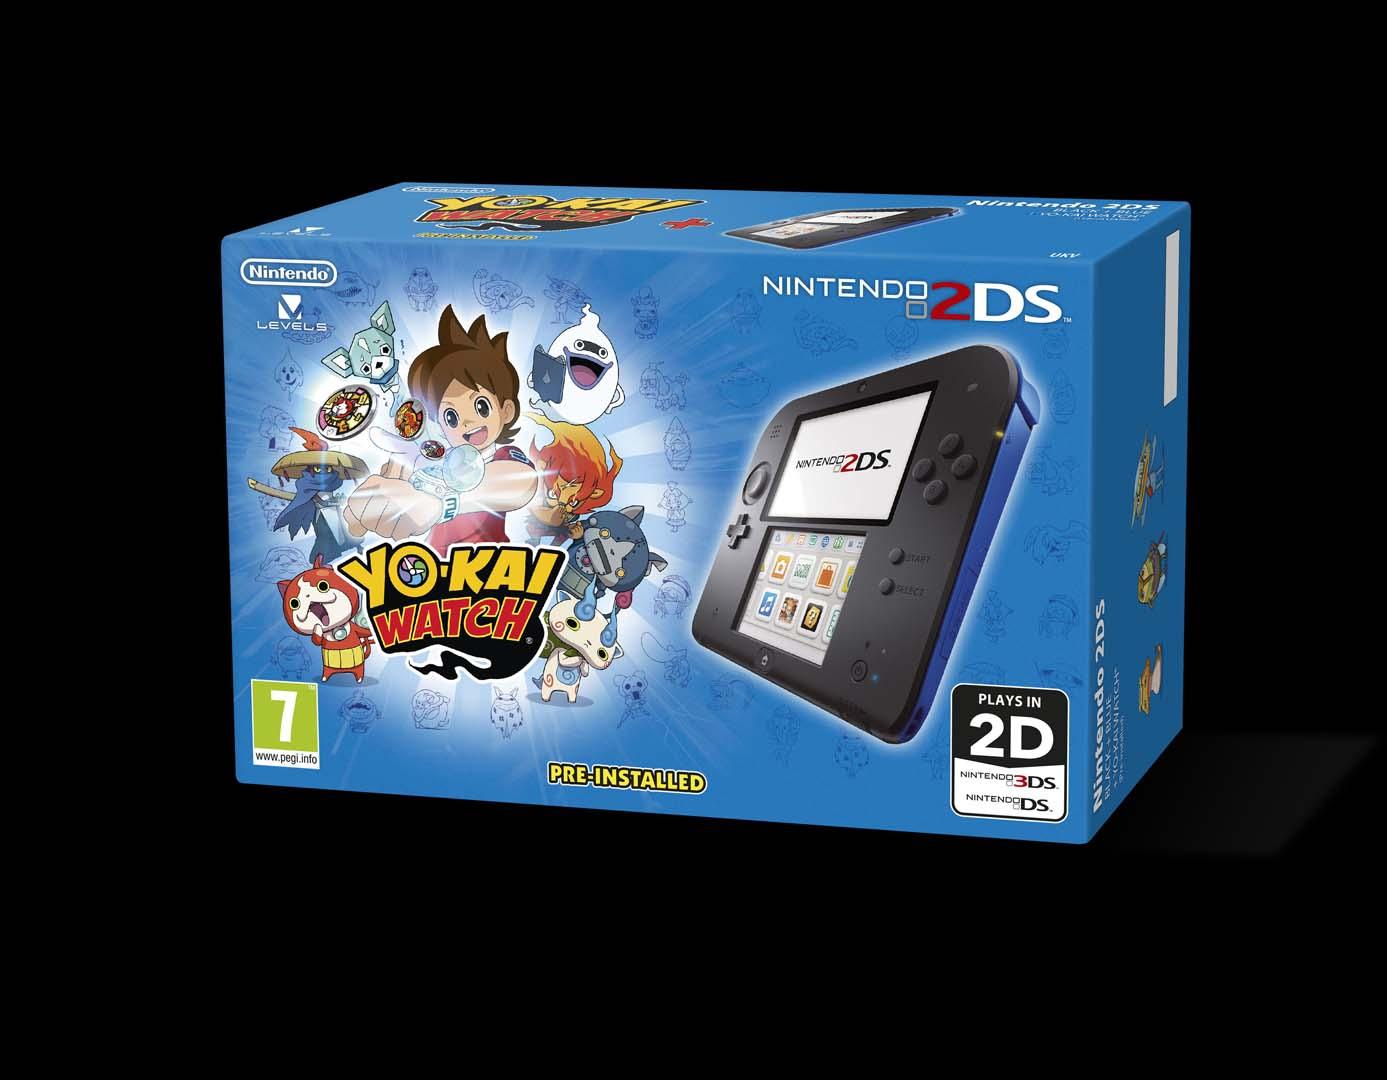 N3DS_YokaiWatch_Packshott_FTR_YO-KAI_Watch_preinstal_Box_3D_PS_UKV